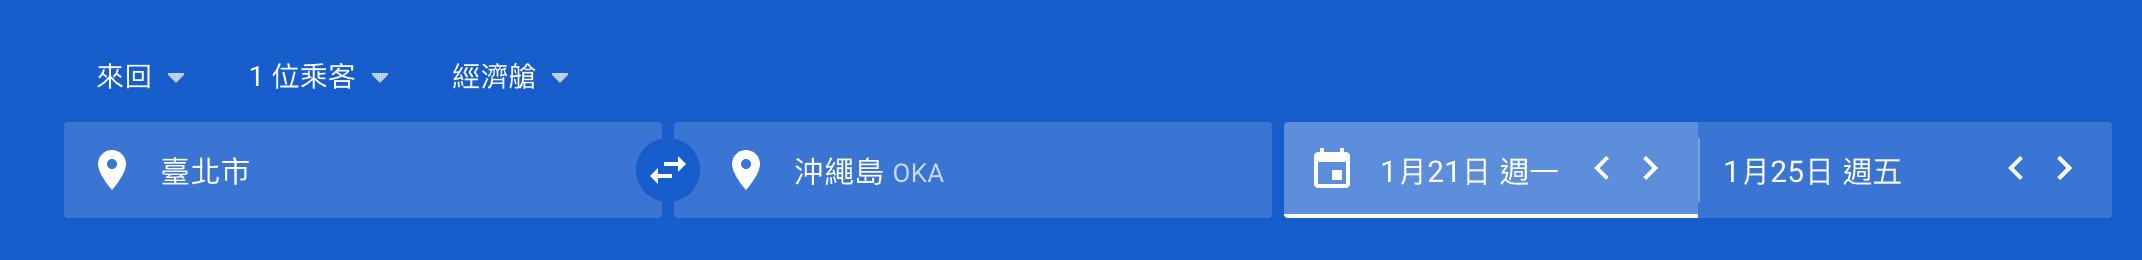 Google Flights 測試一下台北到沖繩的機票(研究生的點數旅行筆記)